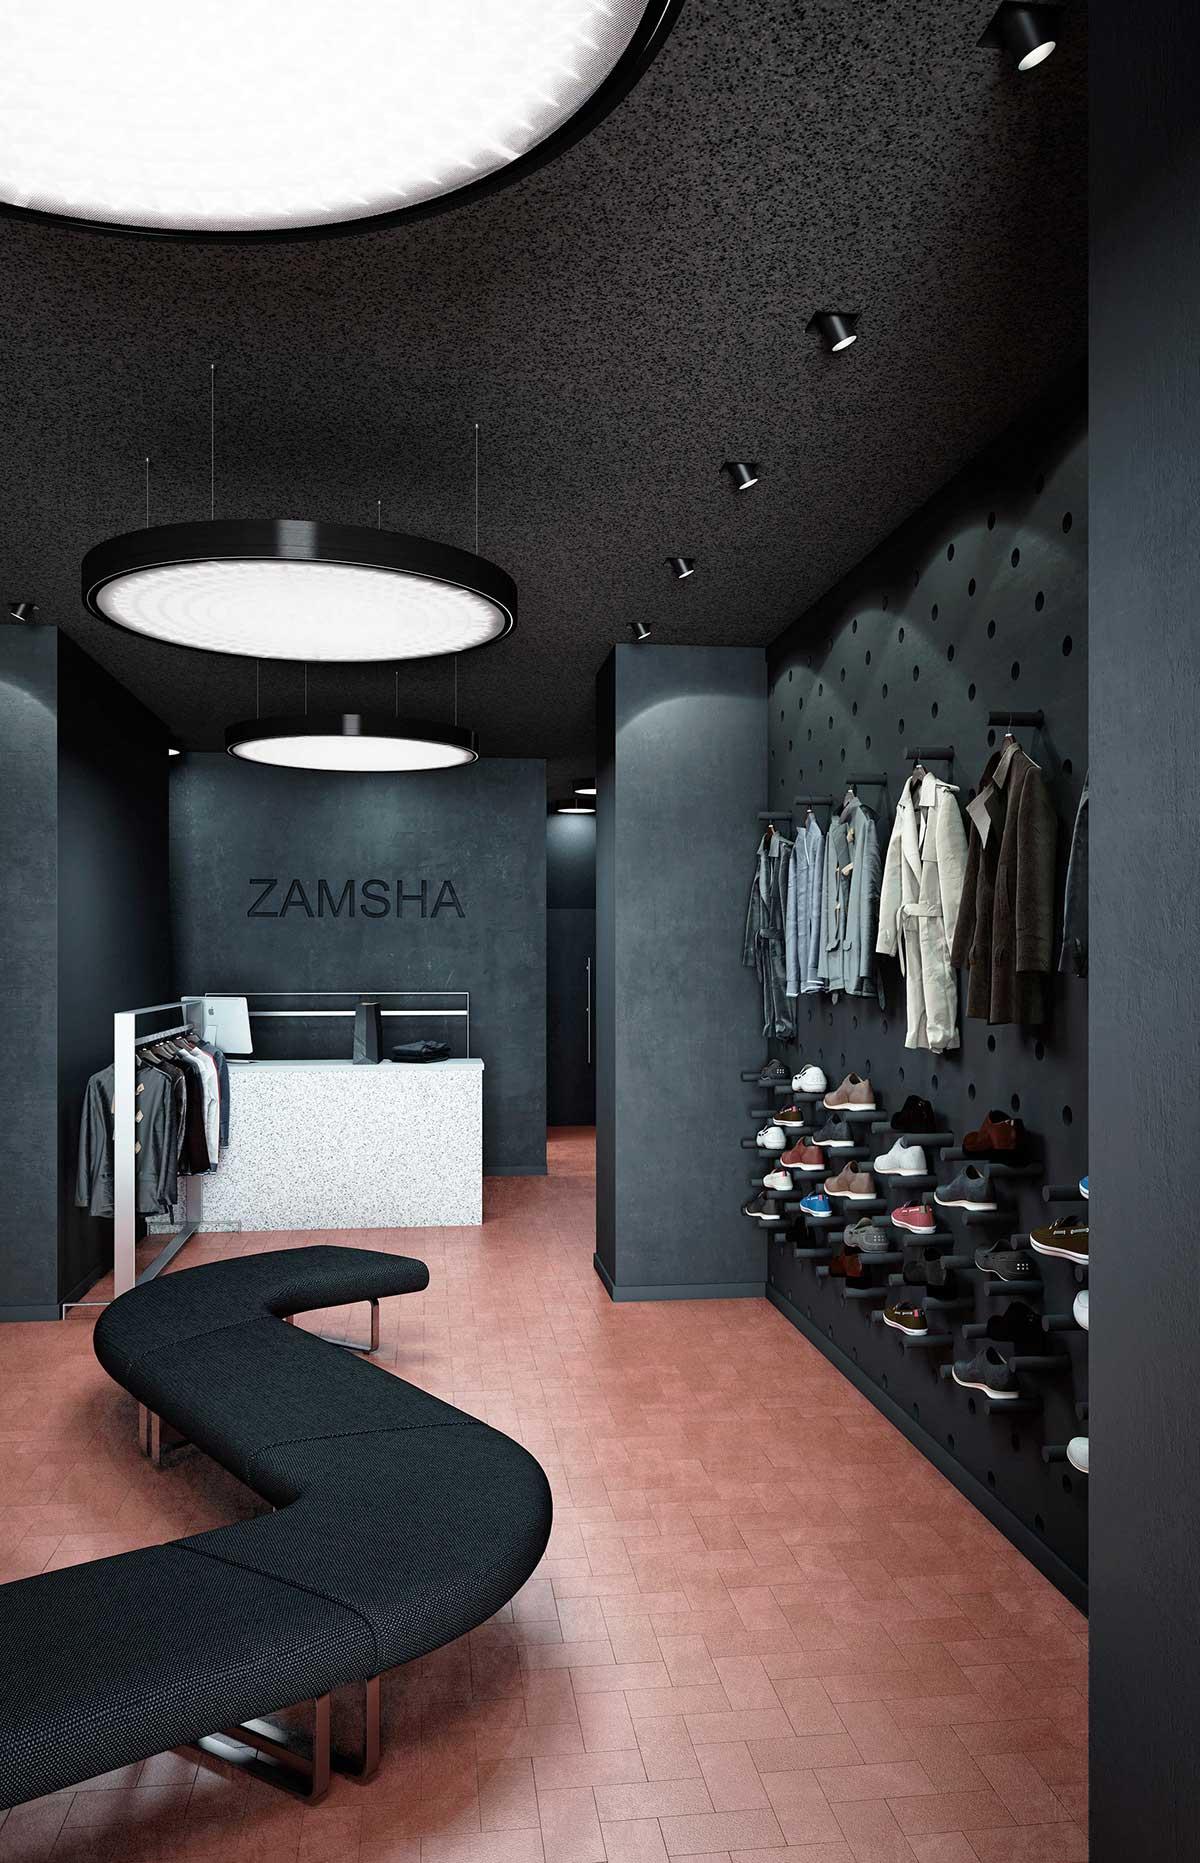 shop decoration3 طراحی دکوراسیون مغازه